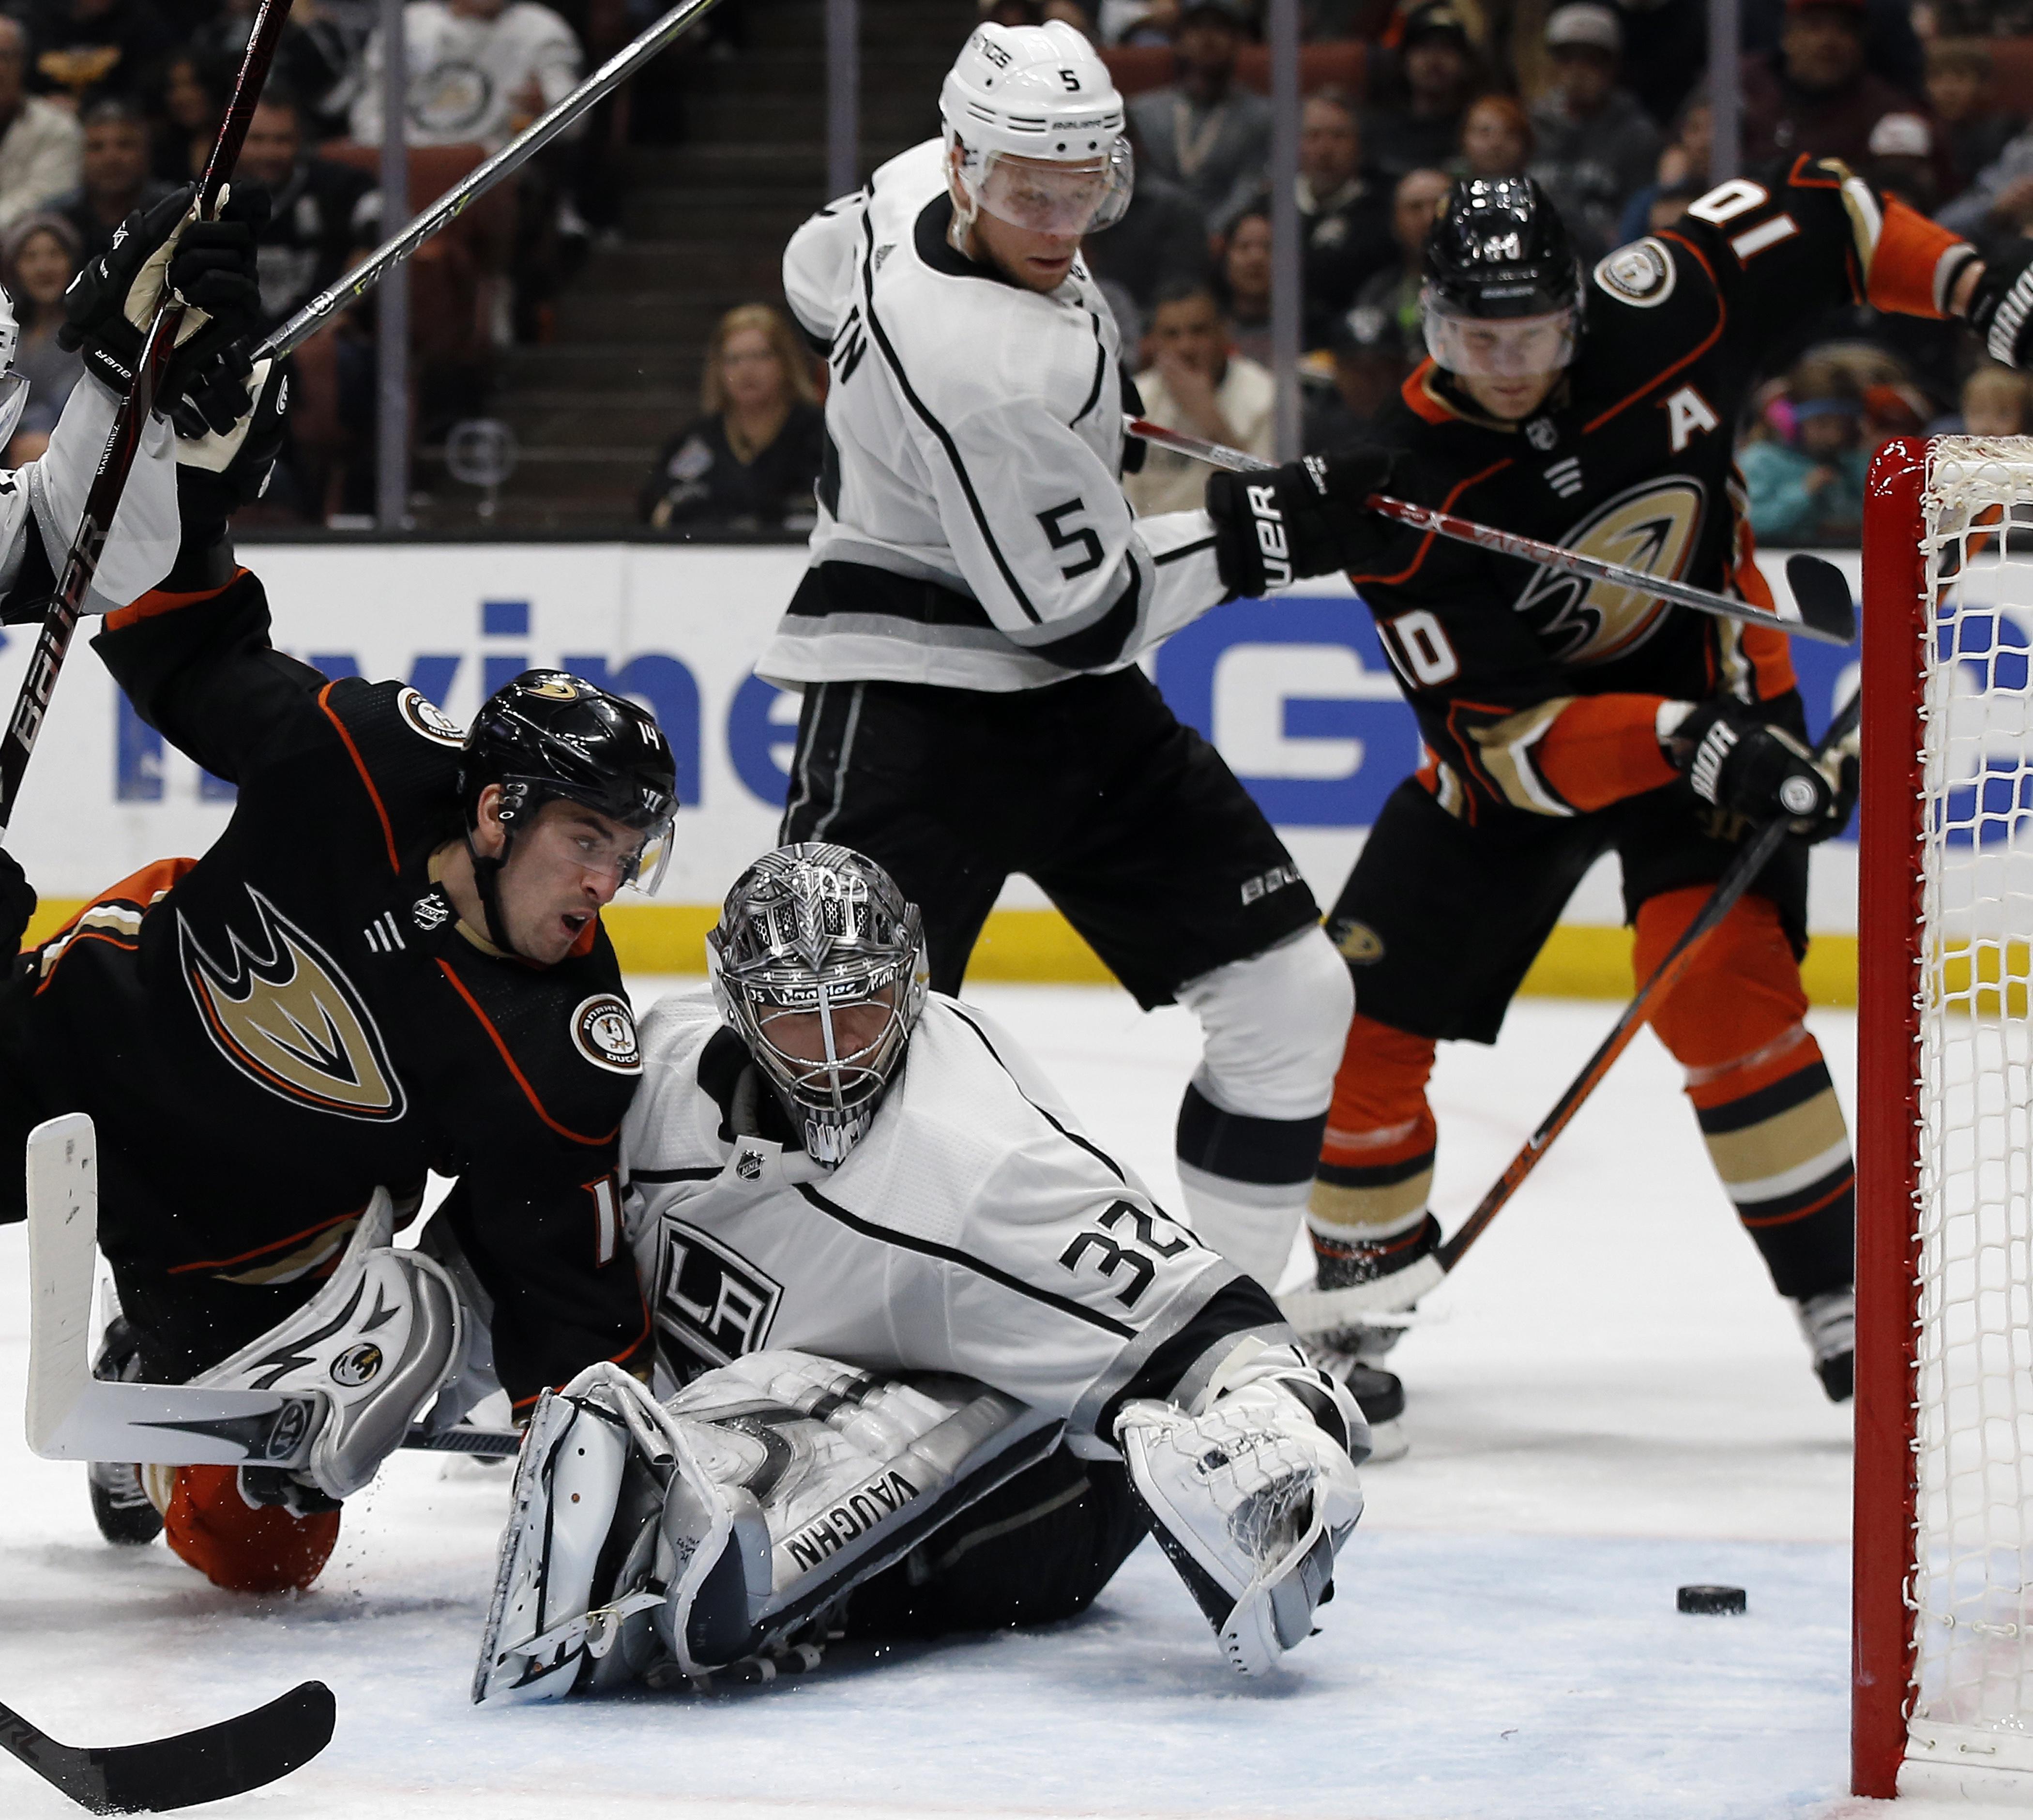 Kings_ducks_hockey_96191